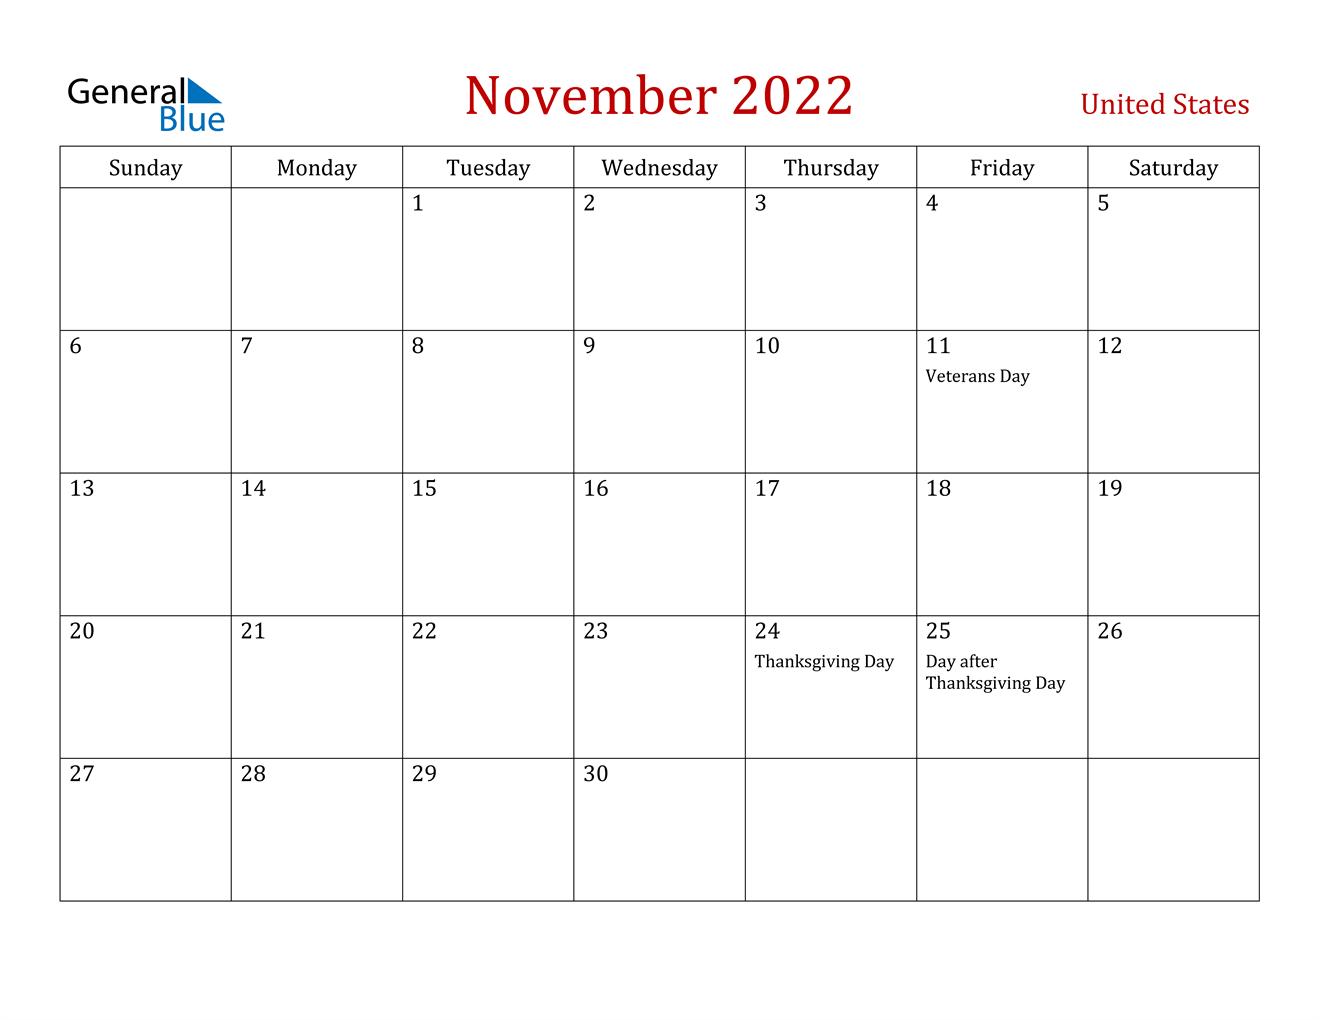 November 2022 Calendar - United States